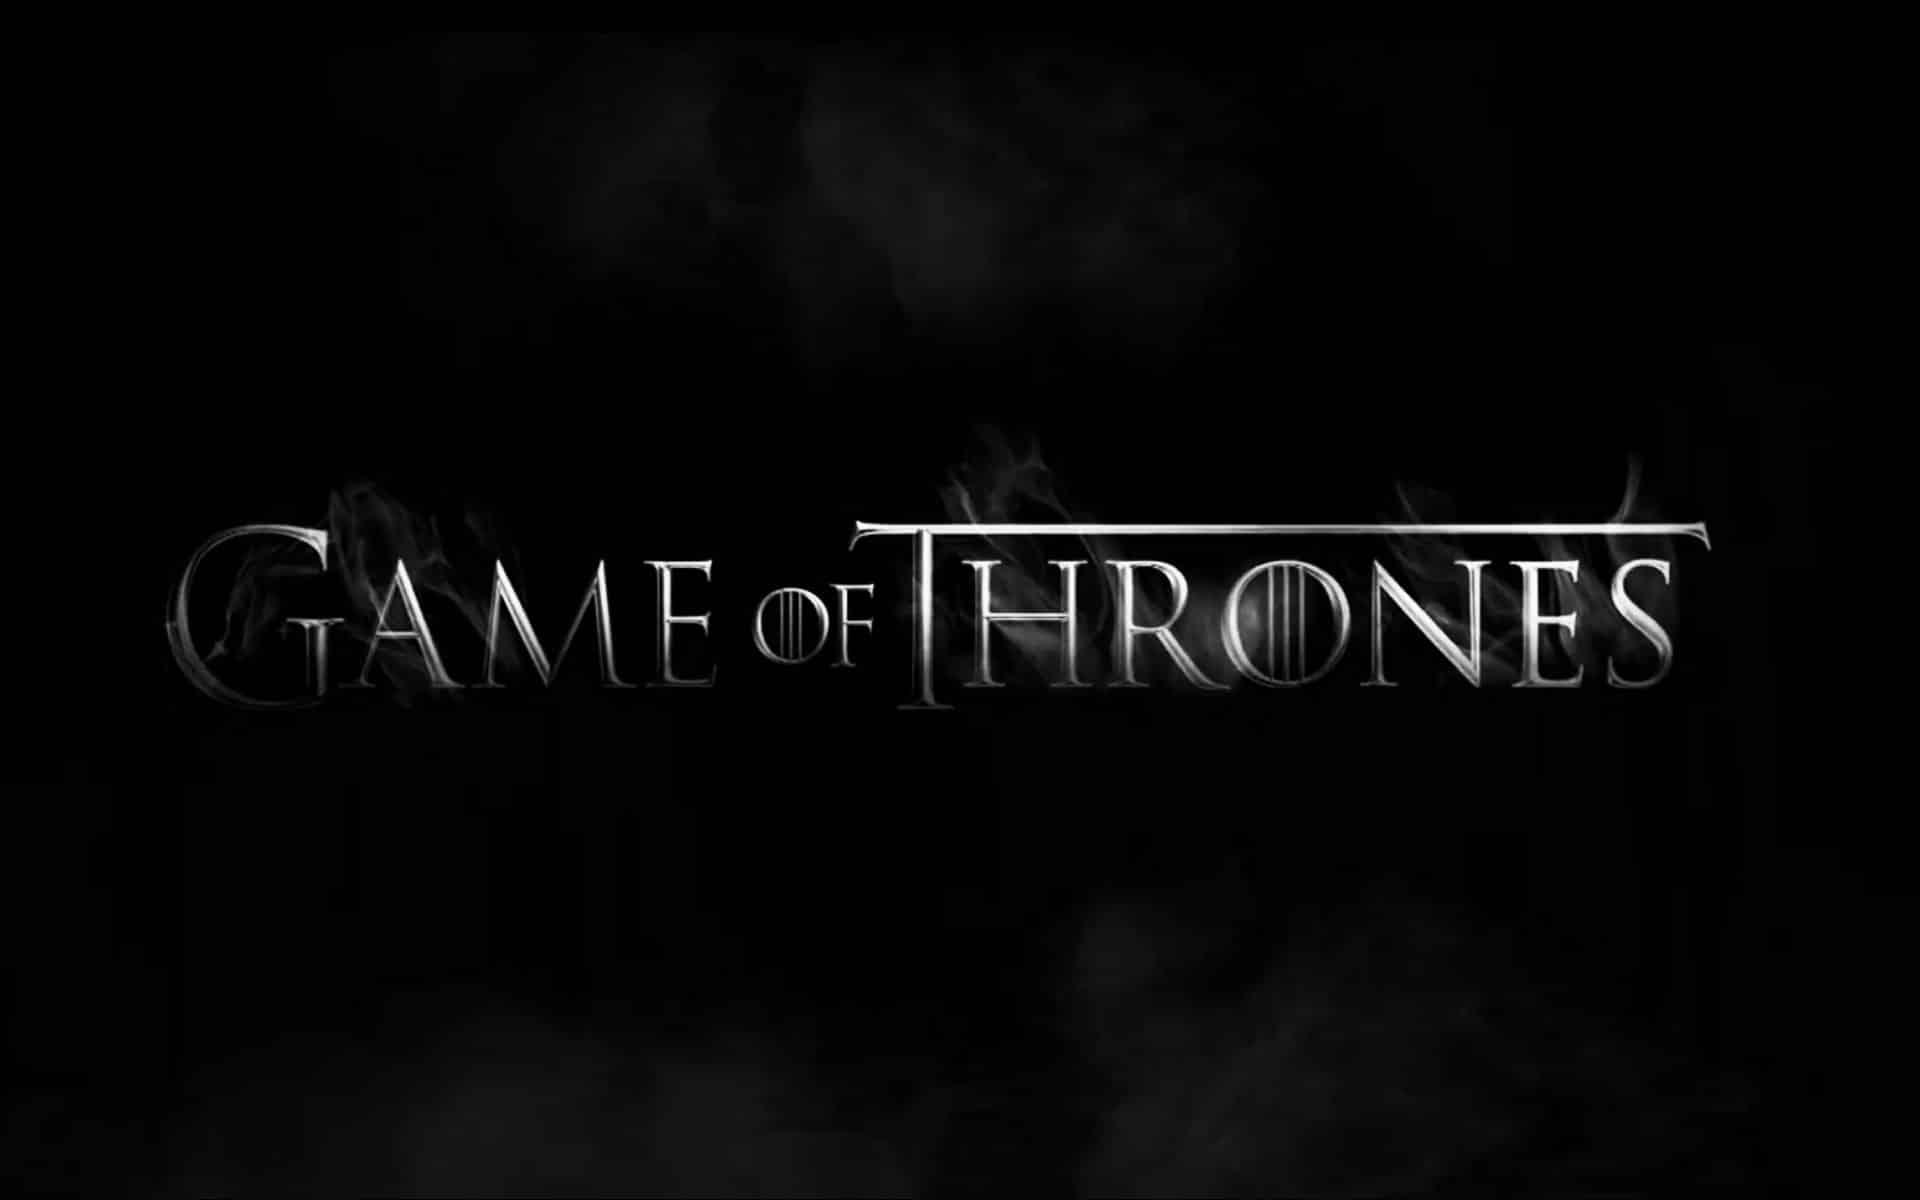 Emilia Clarke Teases Game of Thrones Season 7 images